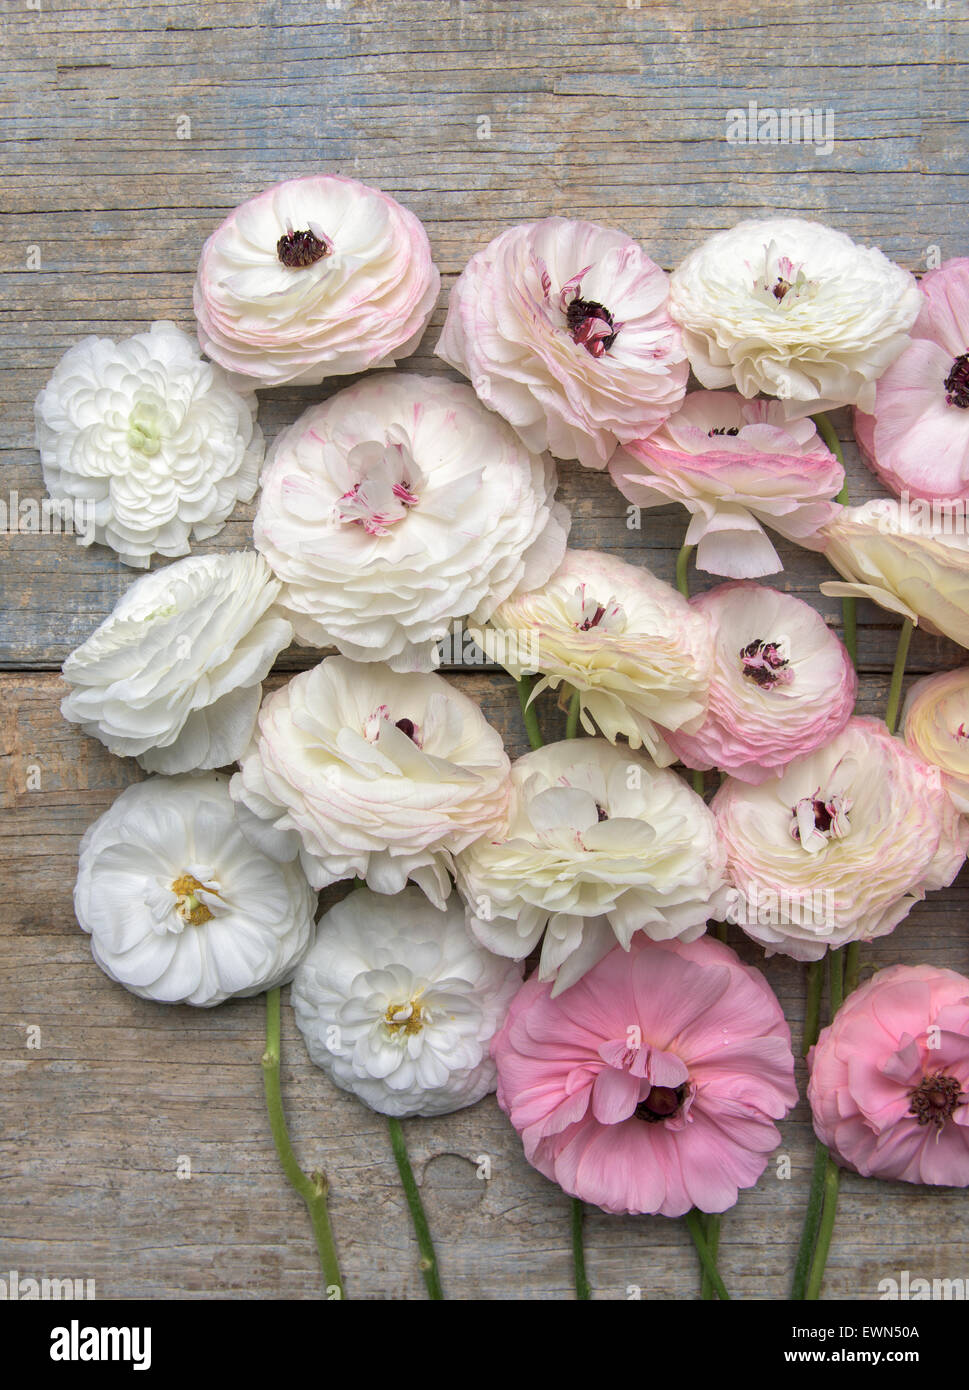 Overhead shot of multi-colored ranunculus blooms - Stock Image